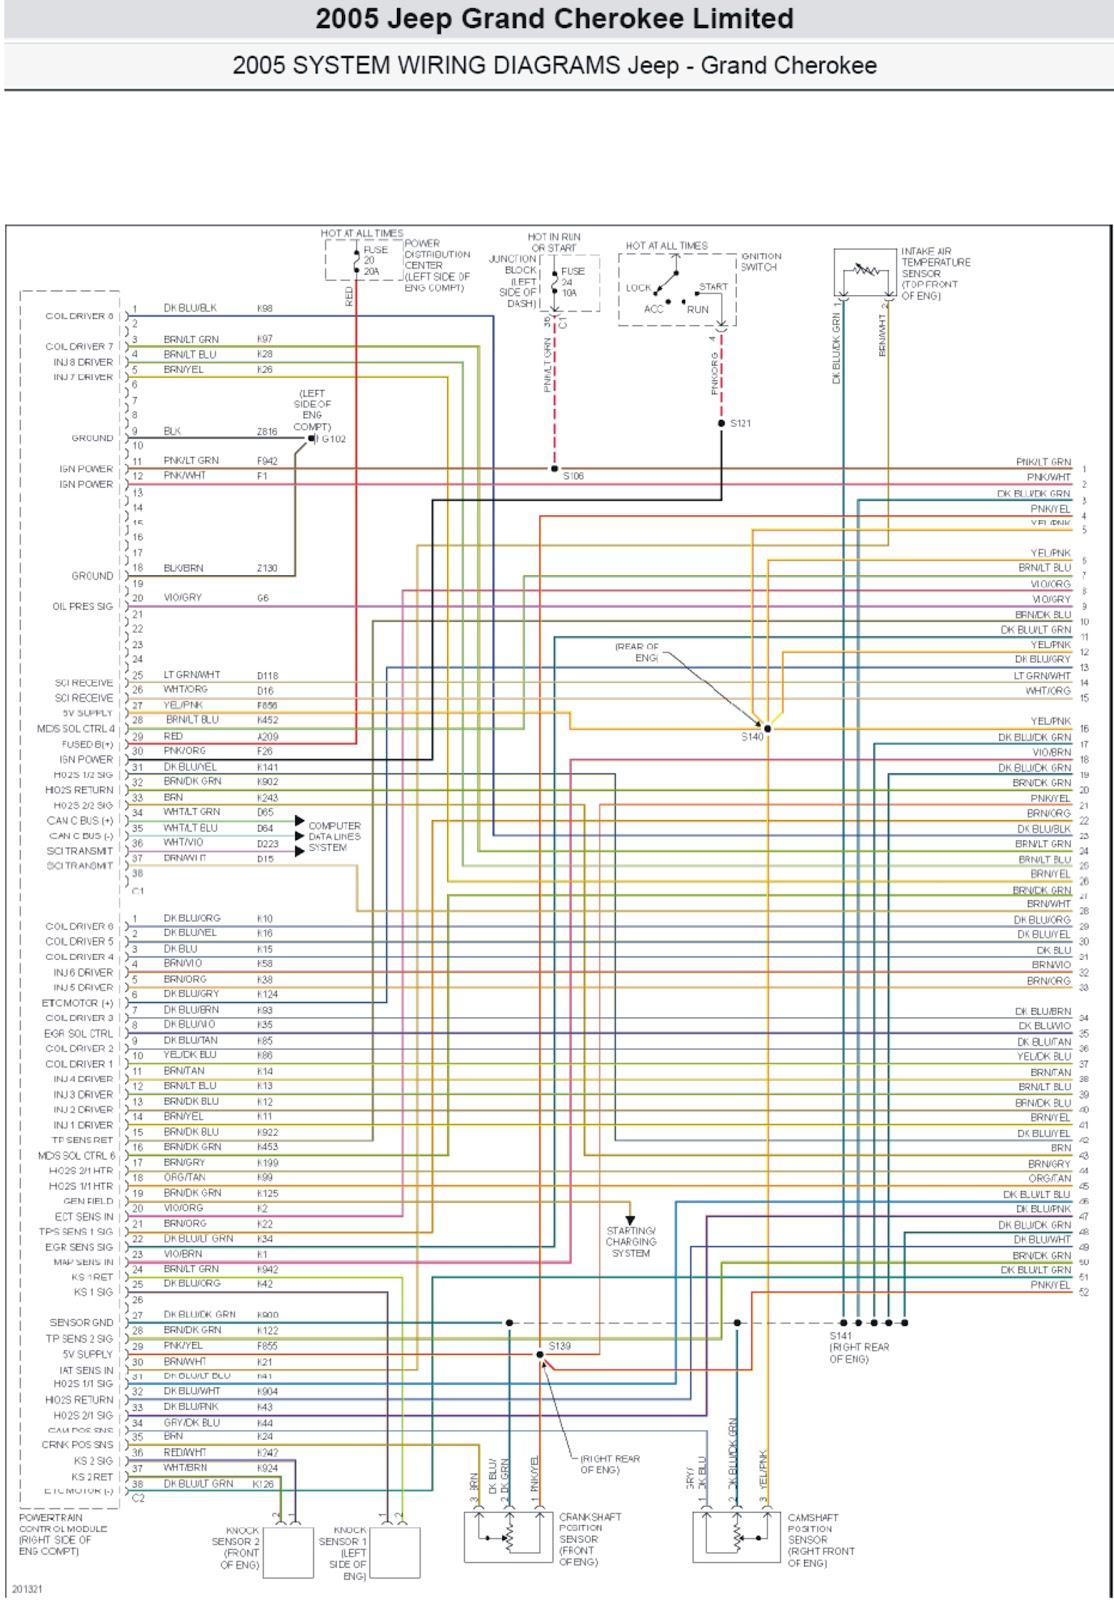 wz_8407] jeep pcm wiring free diagram  icism sapre umize erek hendil mohammedshrine librar wiring 101